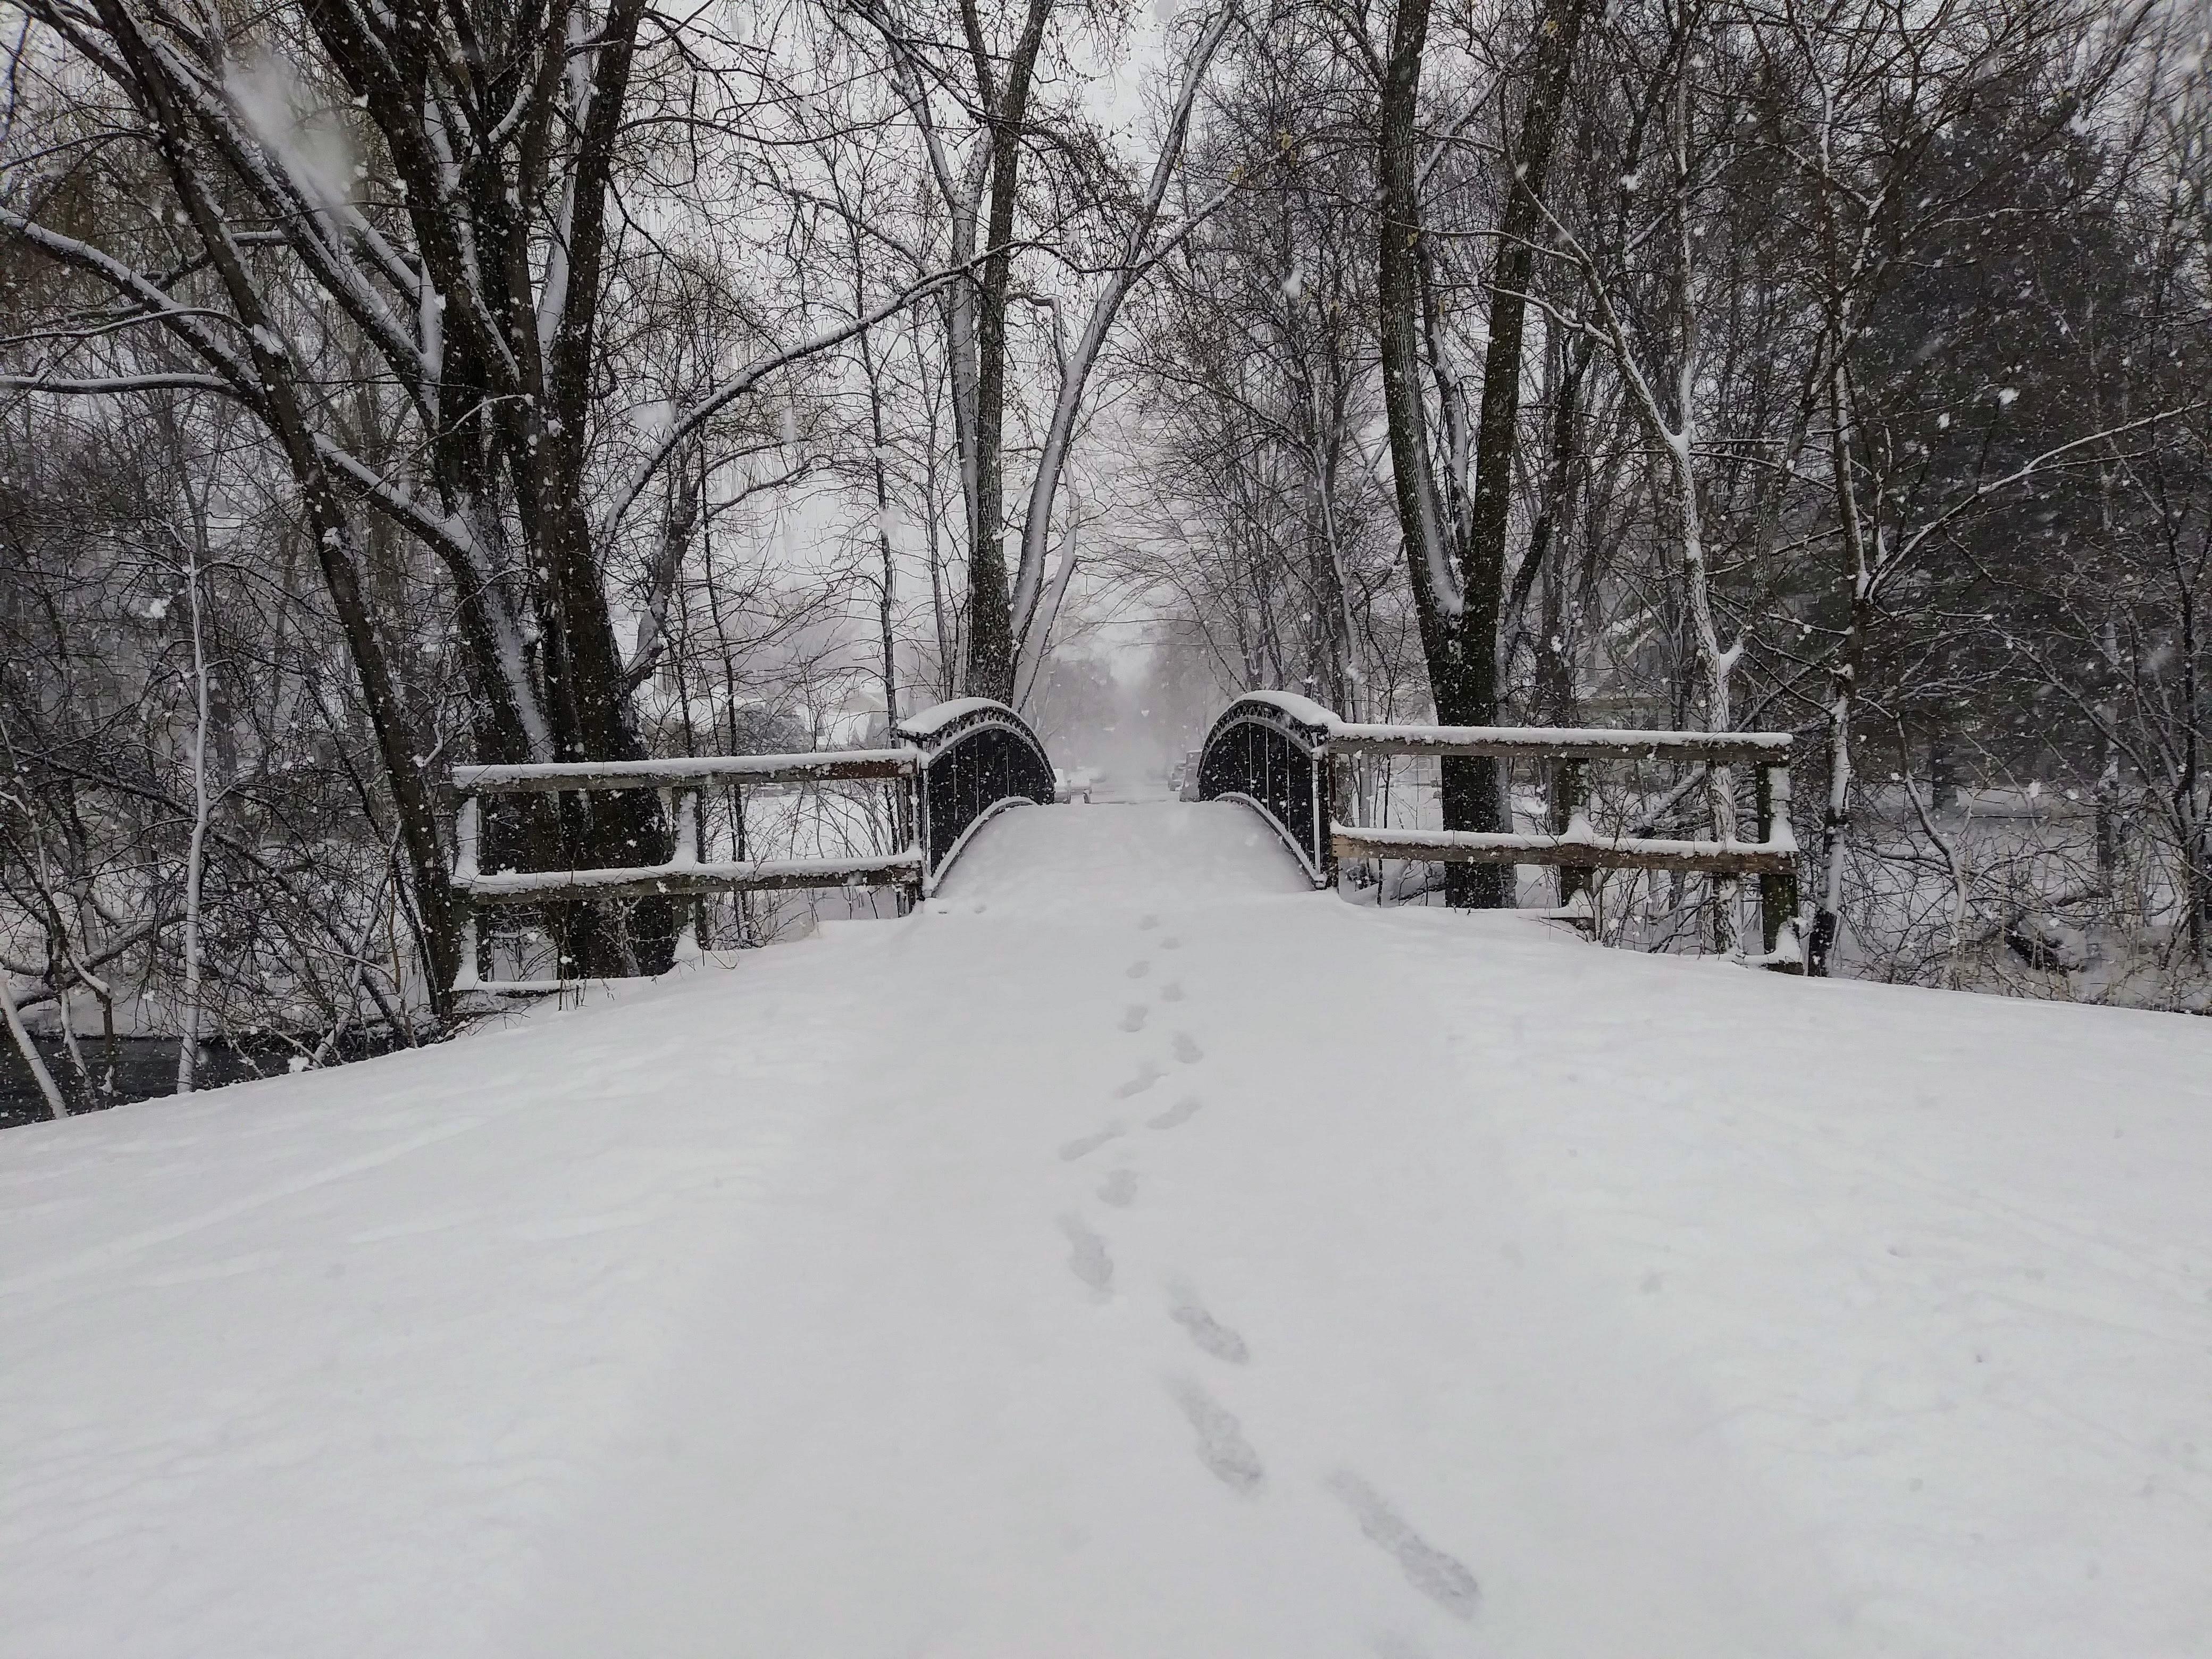 snowy on bridge